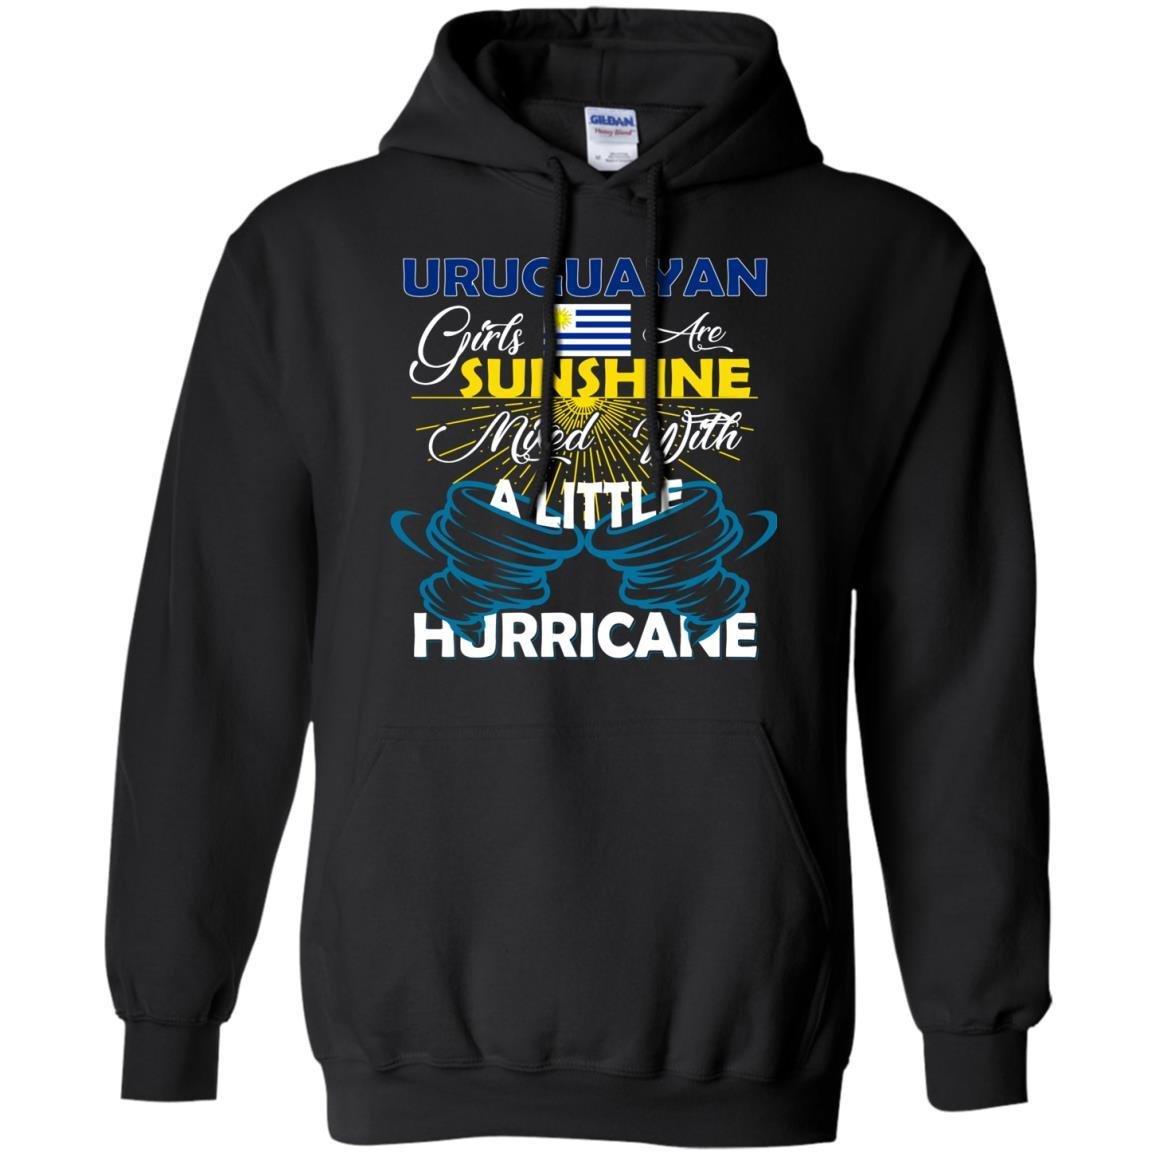 FavoryStore Uruguayan Girls Are Sunshine Mixed With a Little Hurricane Shirt Uruguayan Hoodie